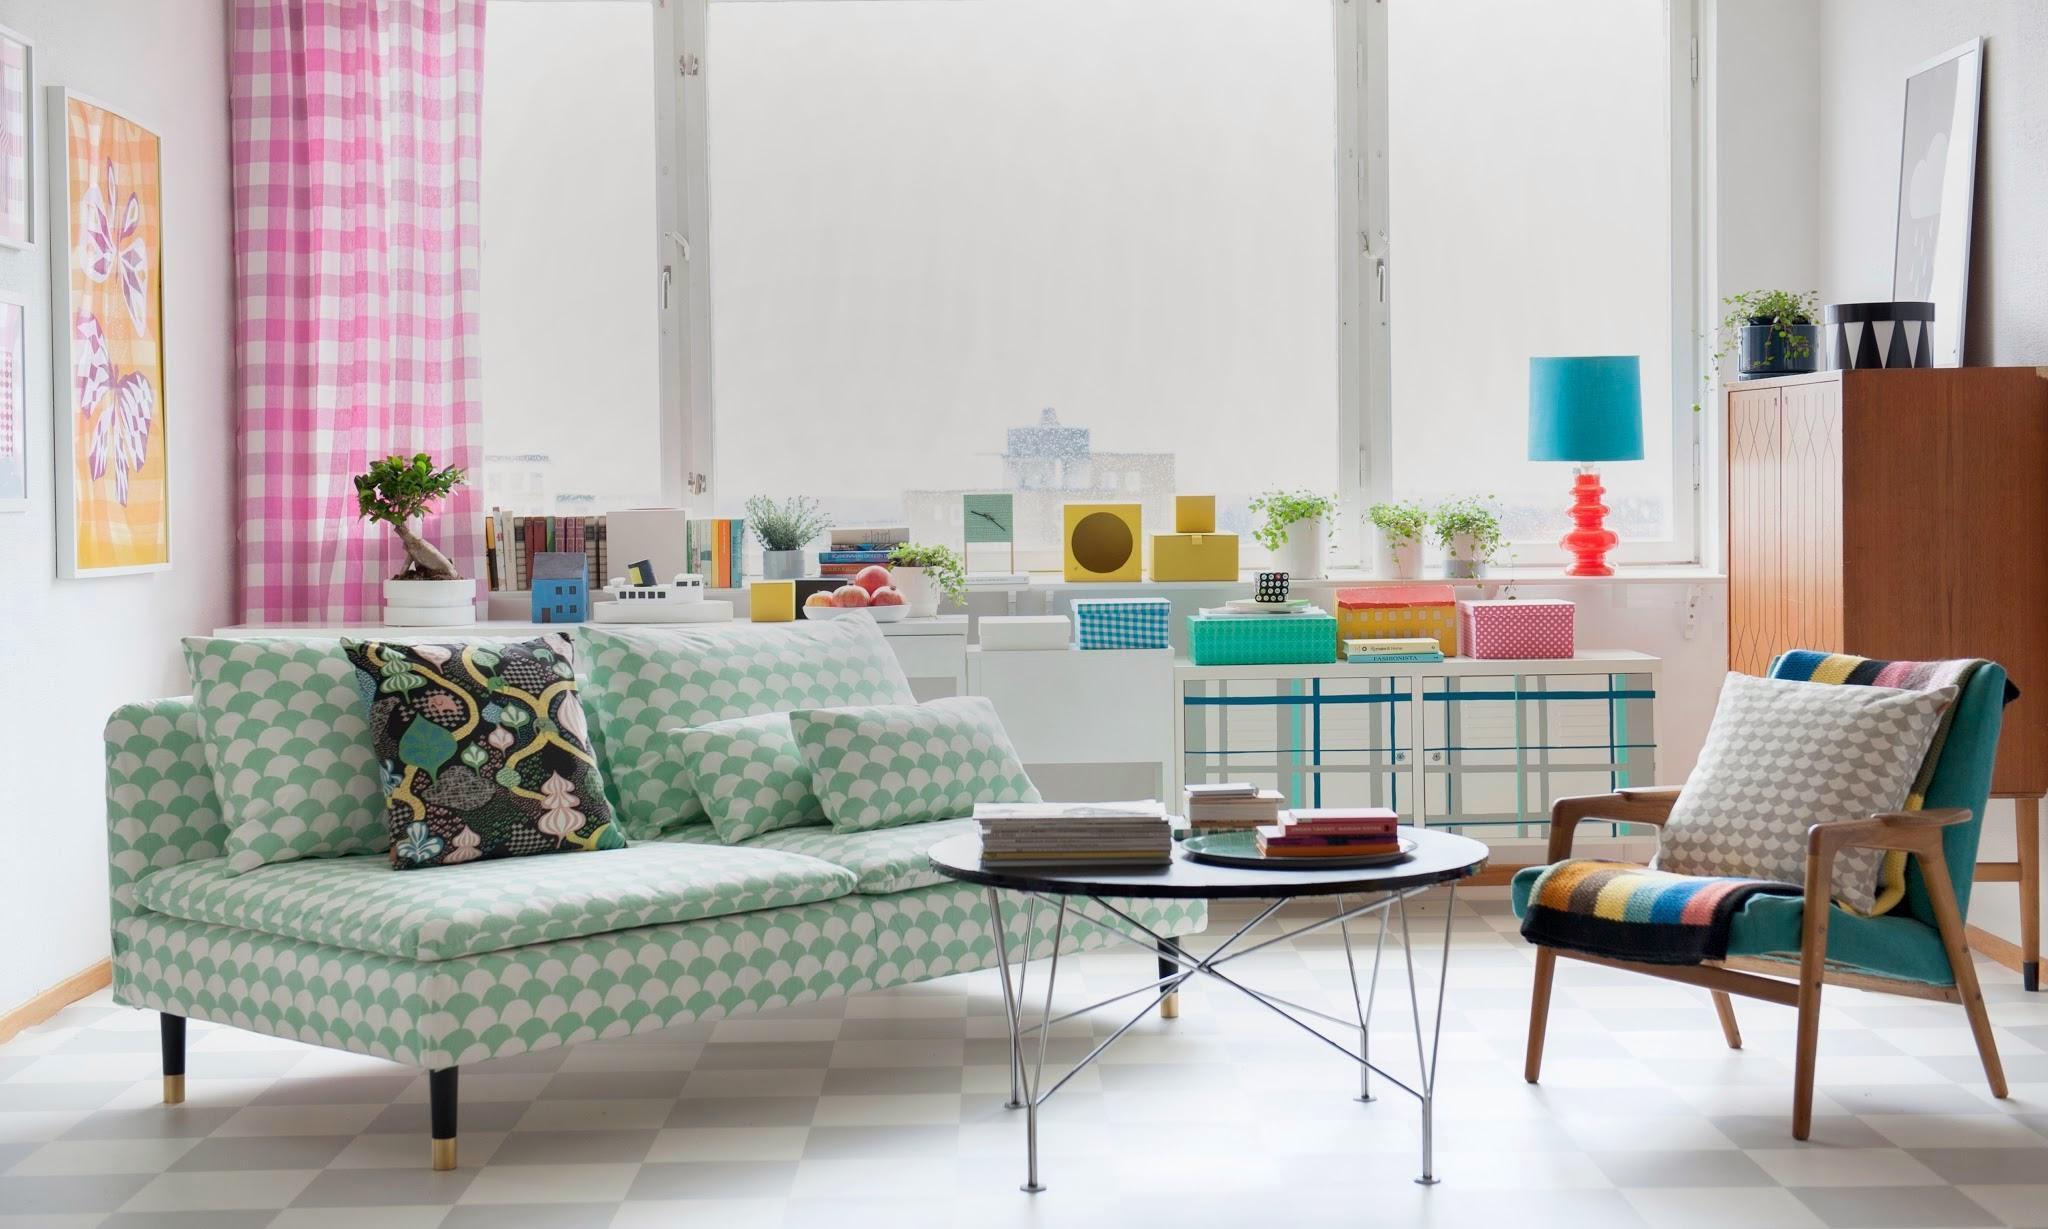 Best Kariertes Sofa In Mintgrn Couchtisch Sessel Ikea Sofa With Sofa Kariert